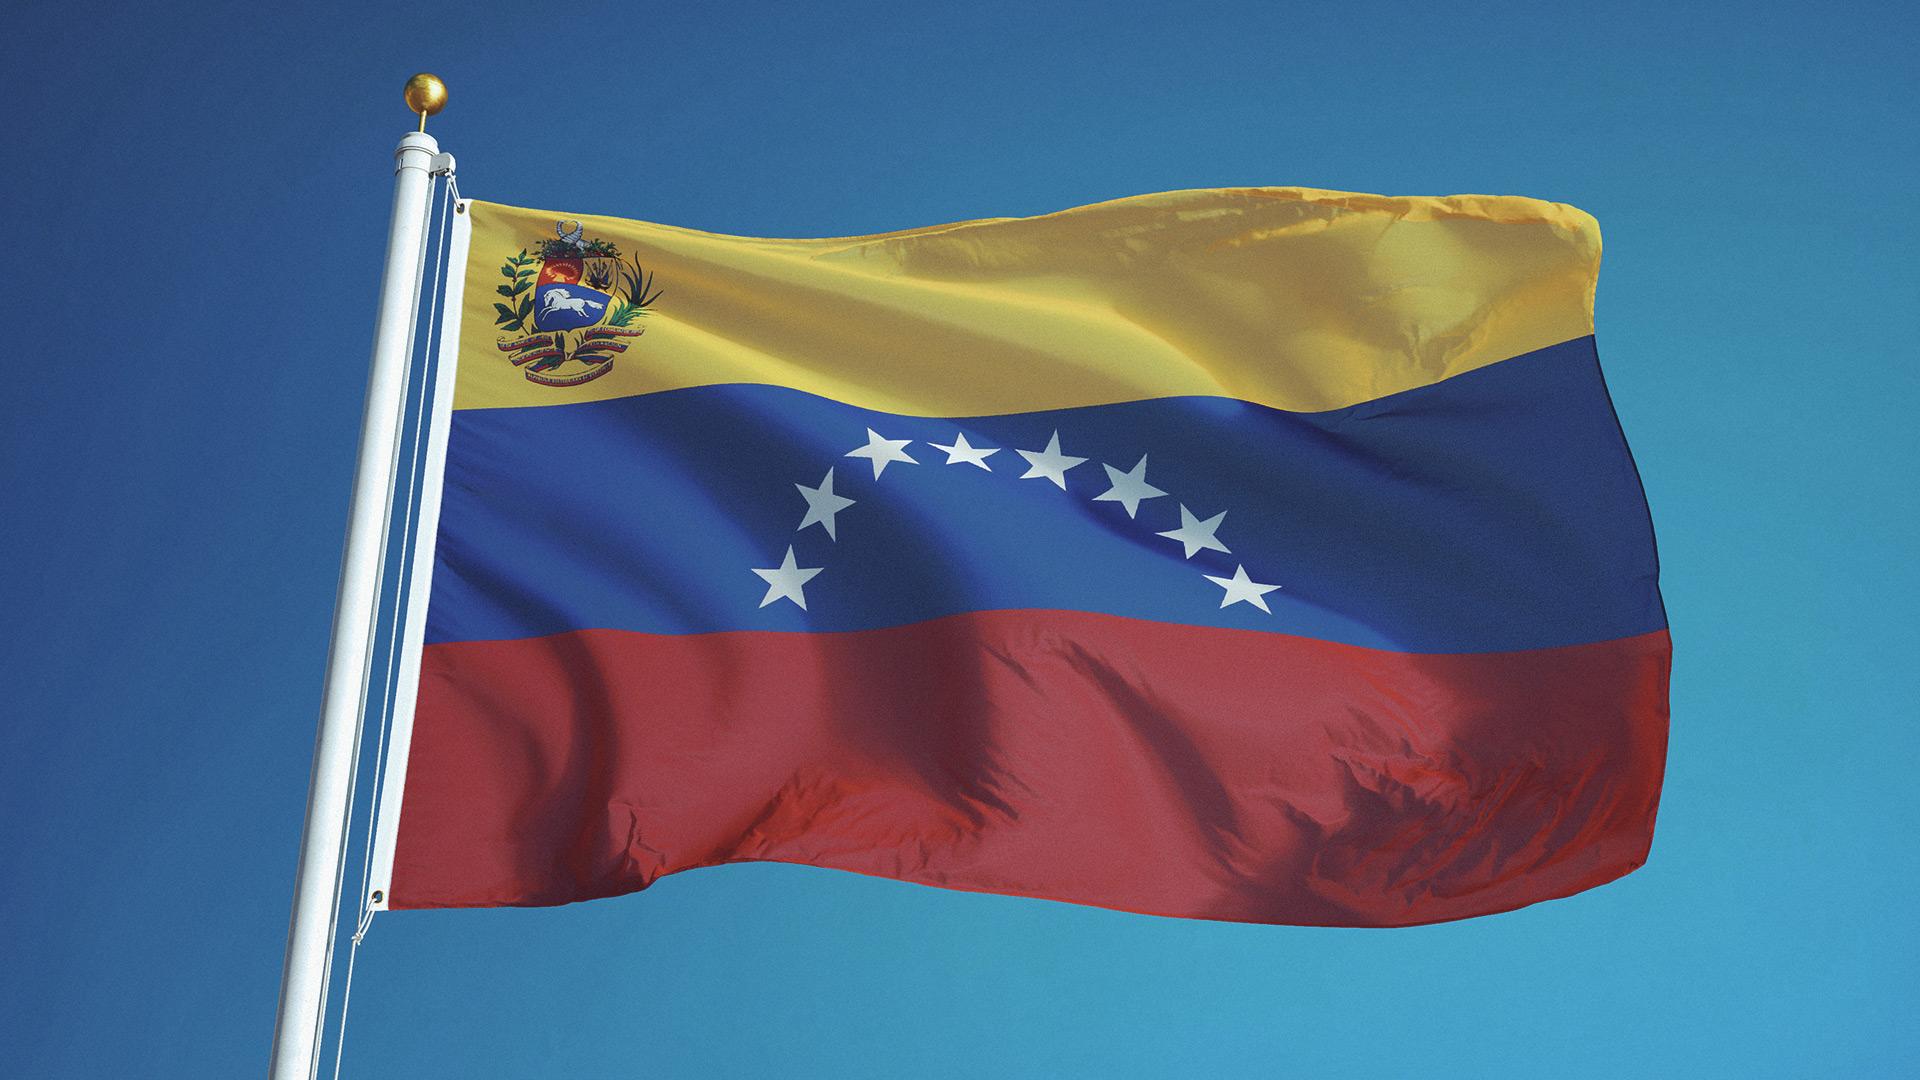 Venezuela just revamped its currency, but it won't stop people seeking digital alternatives